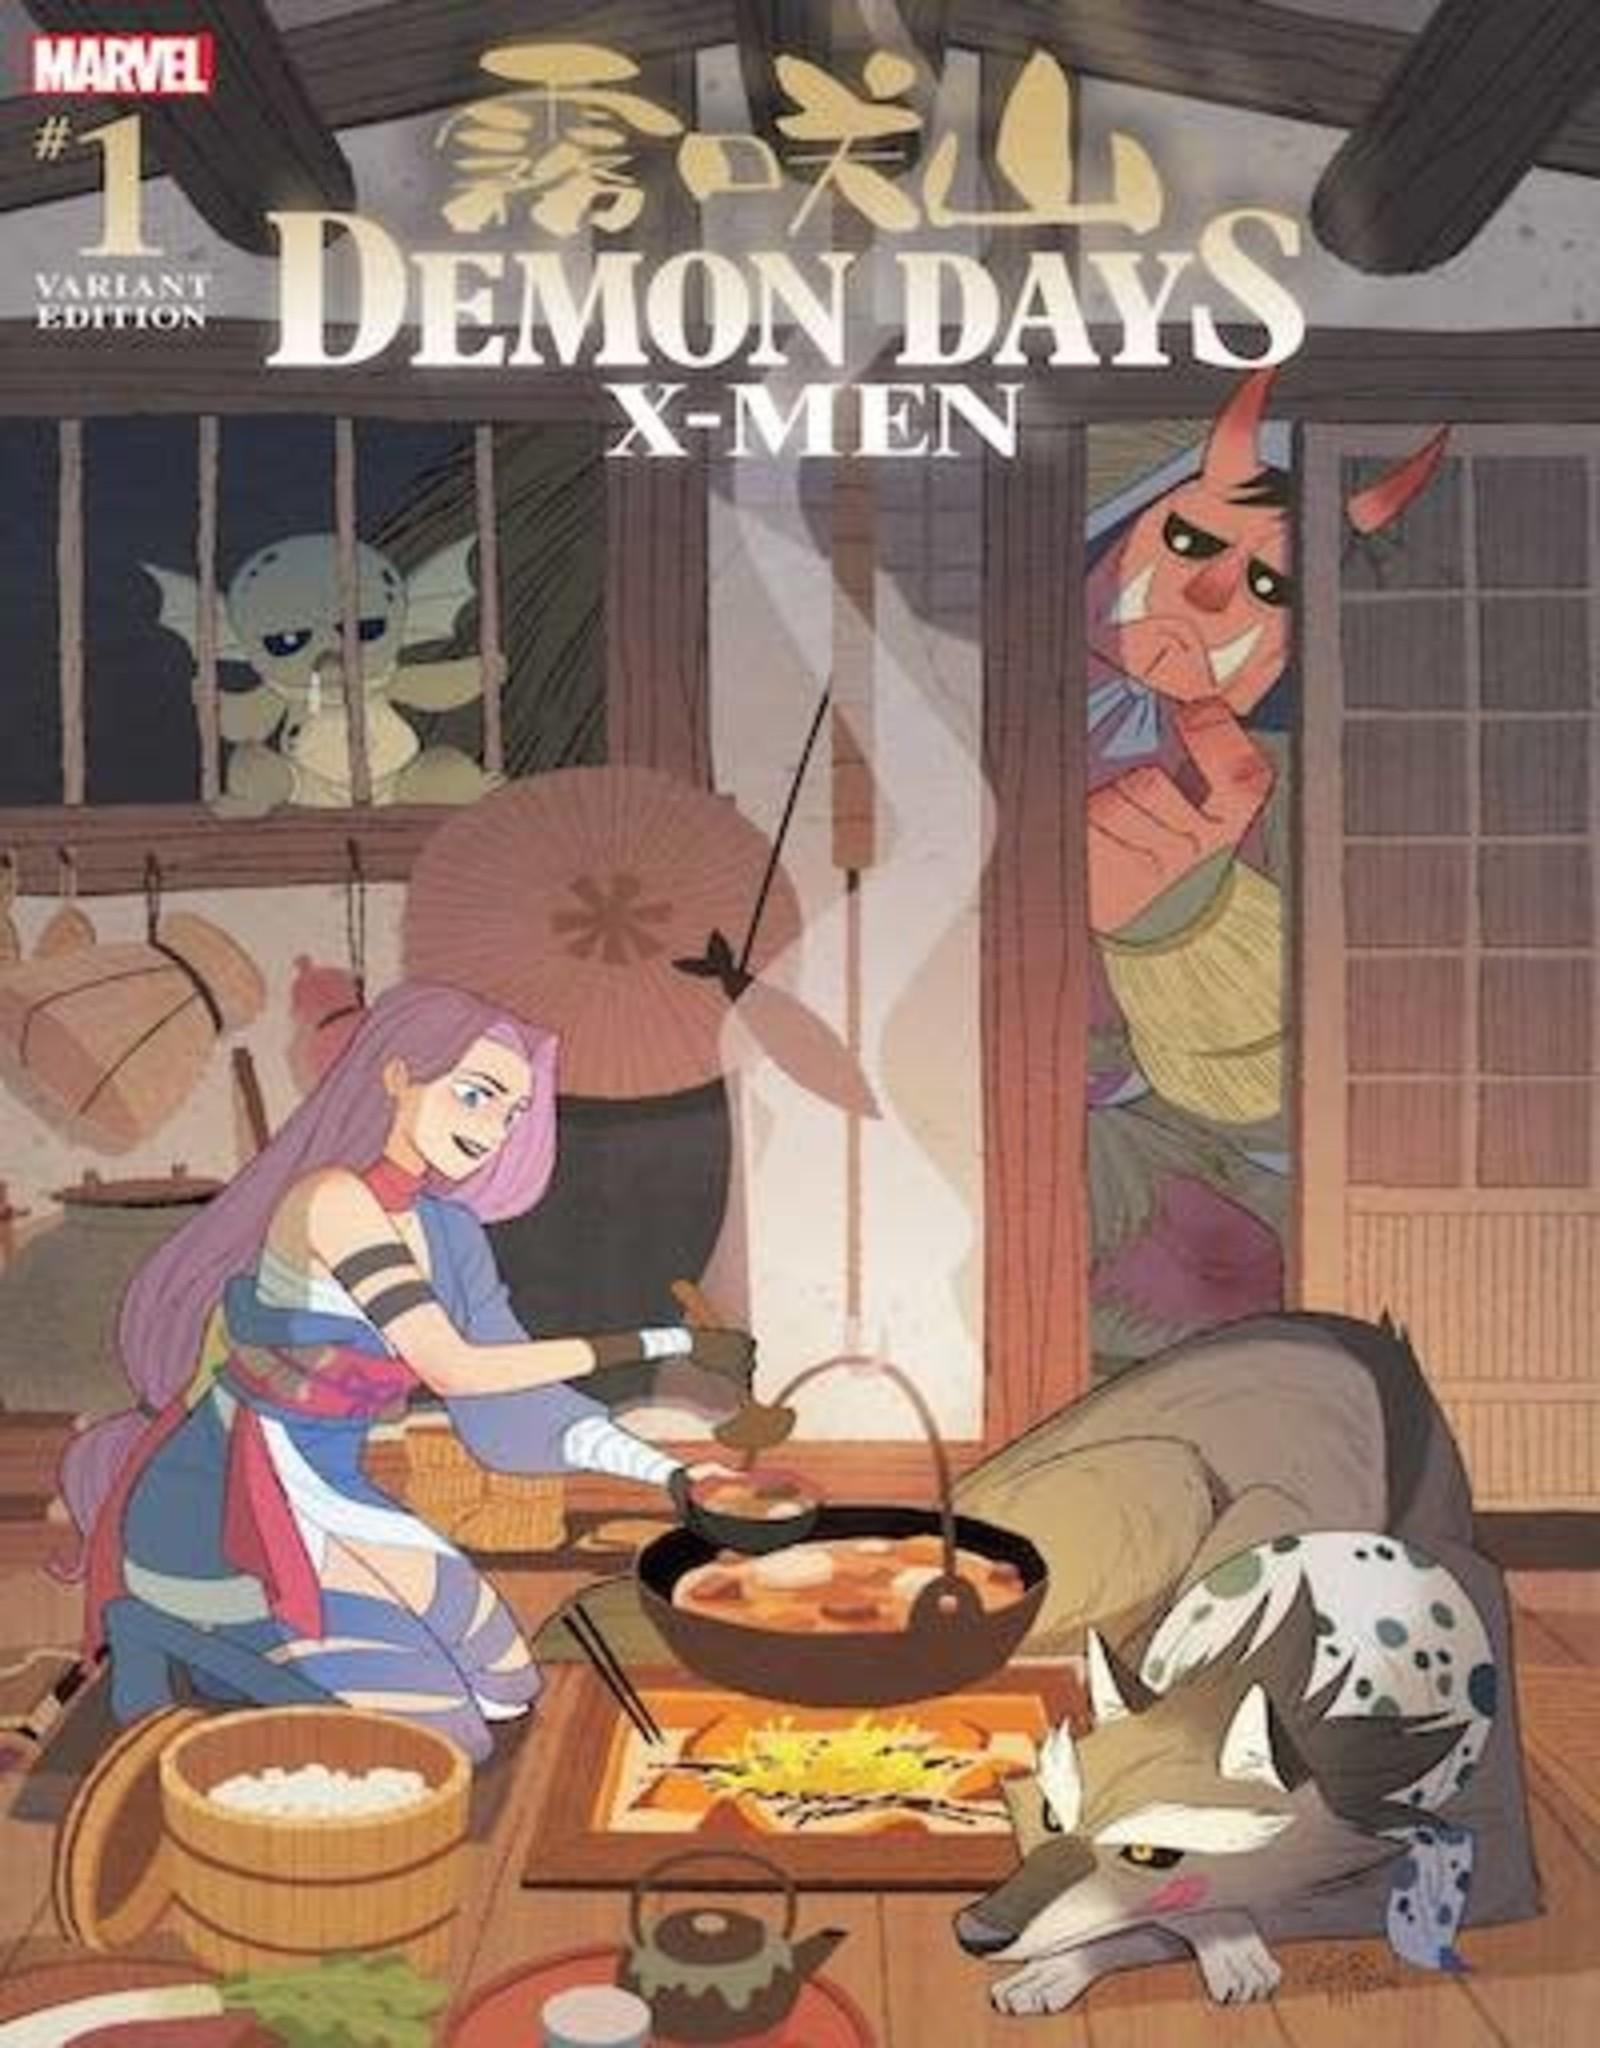 Marvel Comics Demon Days X-Men #1 Gurihiru Var